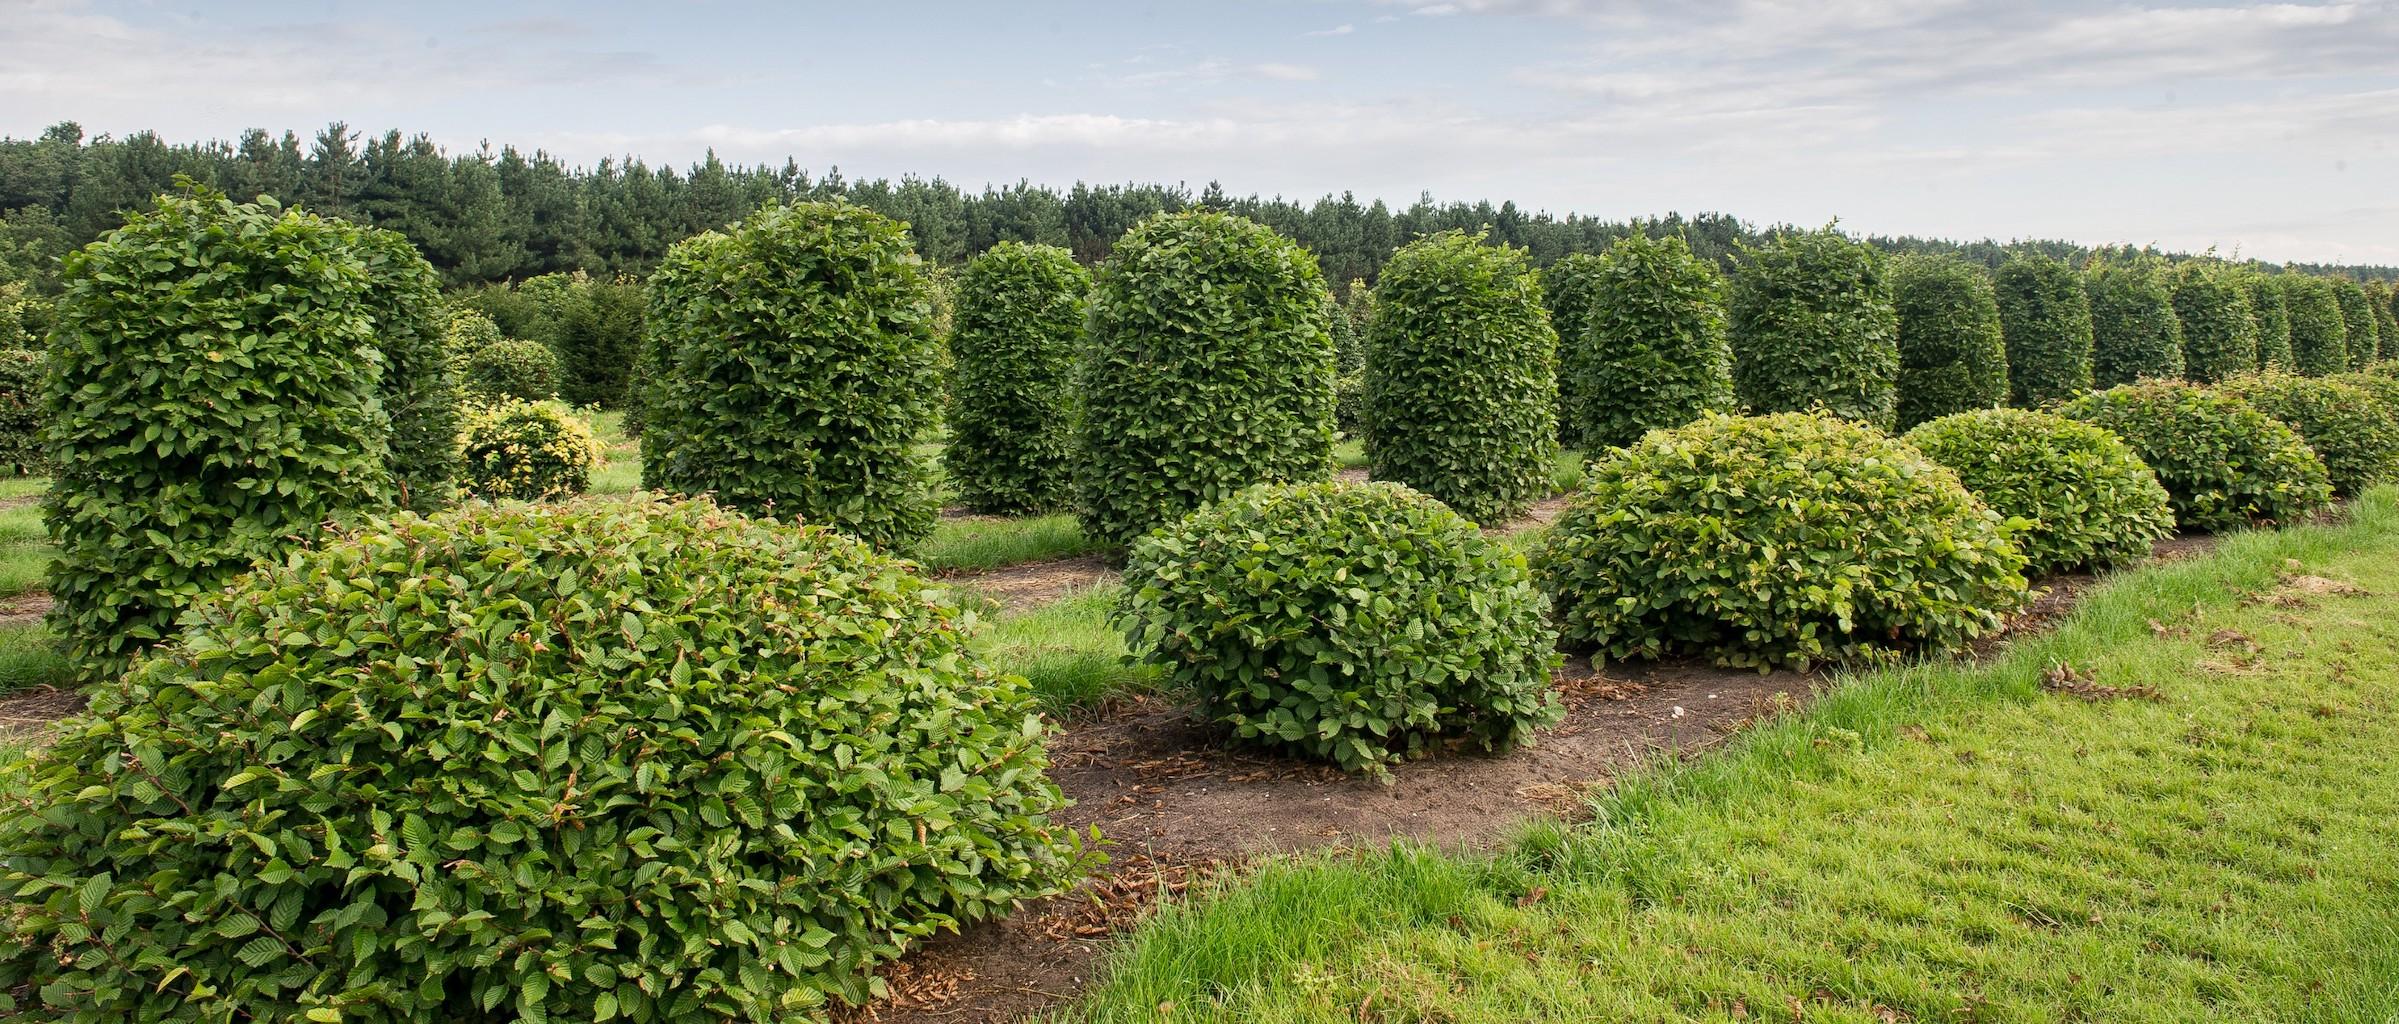 Carpinus betulus topiary Hornbeam domes